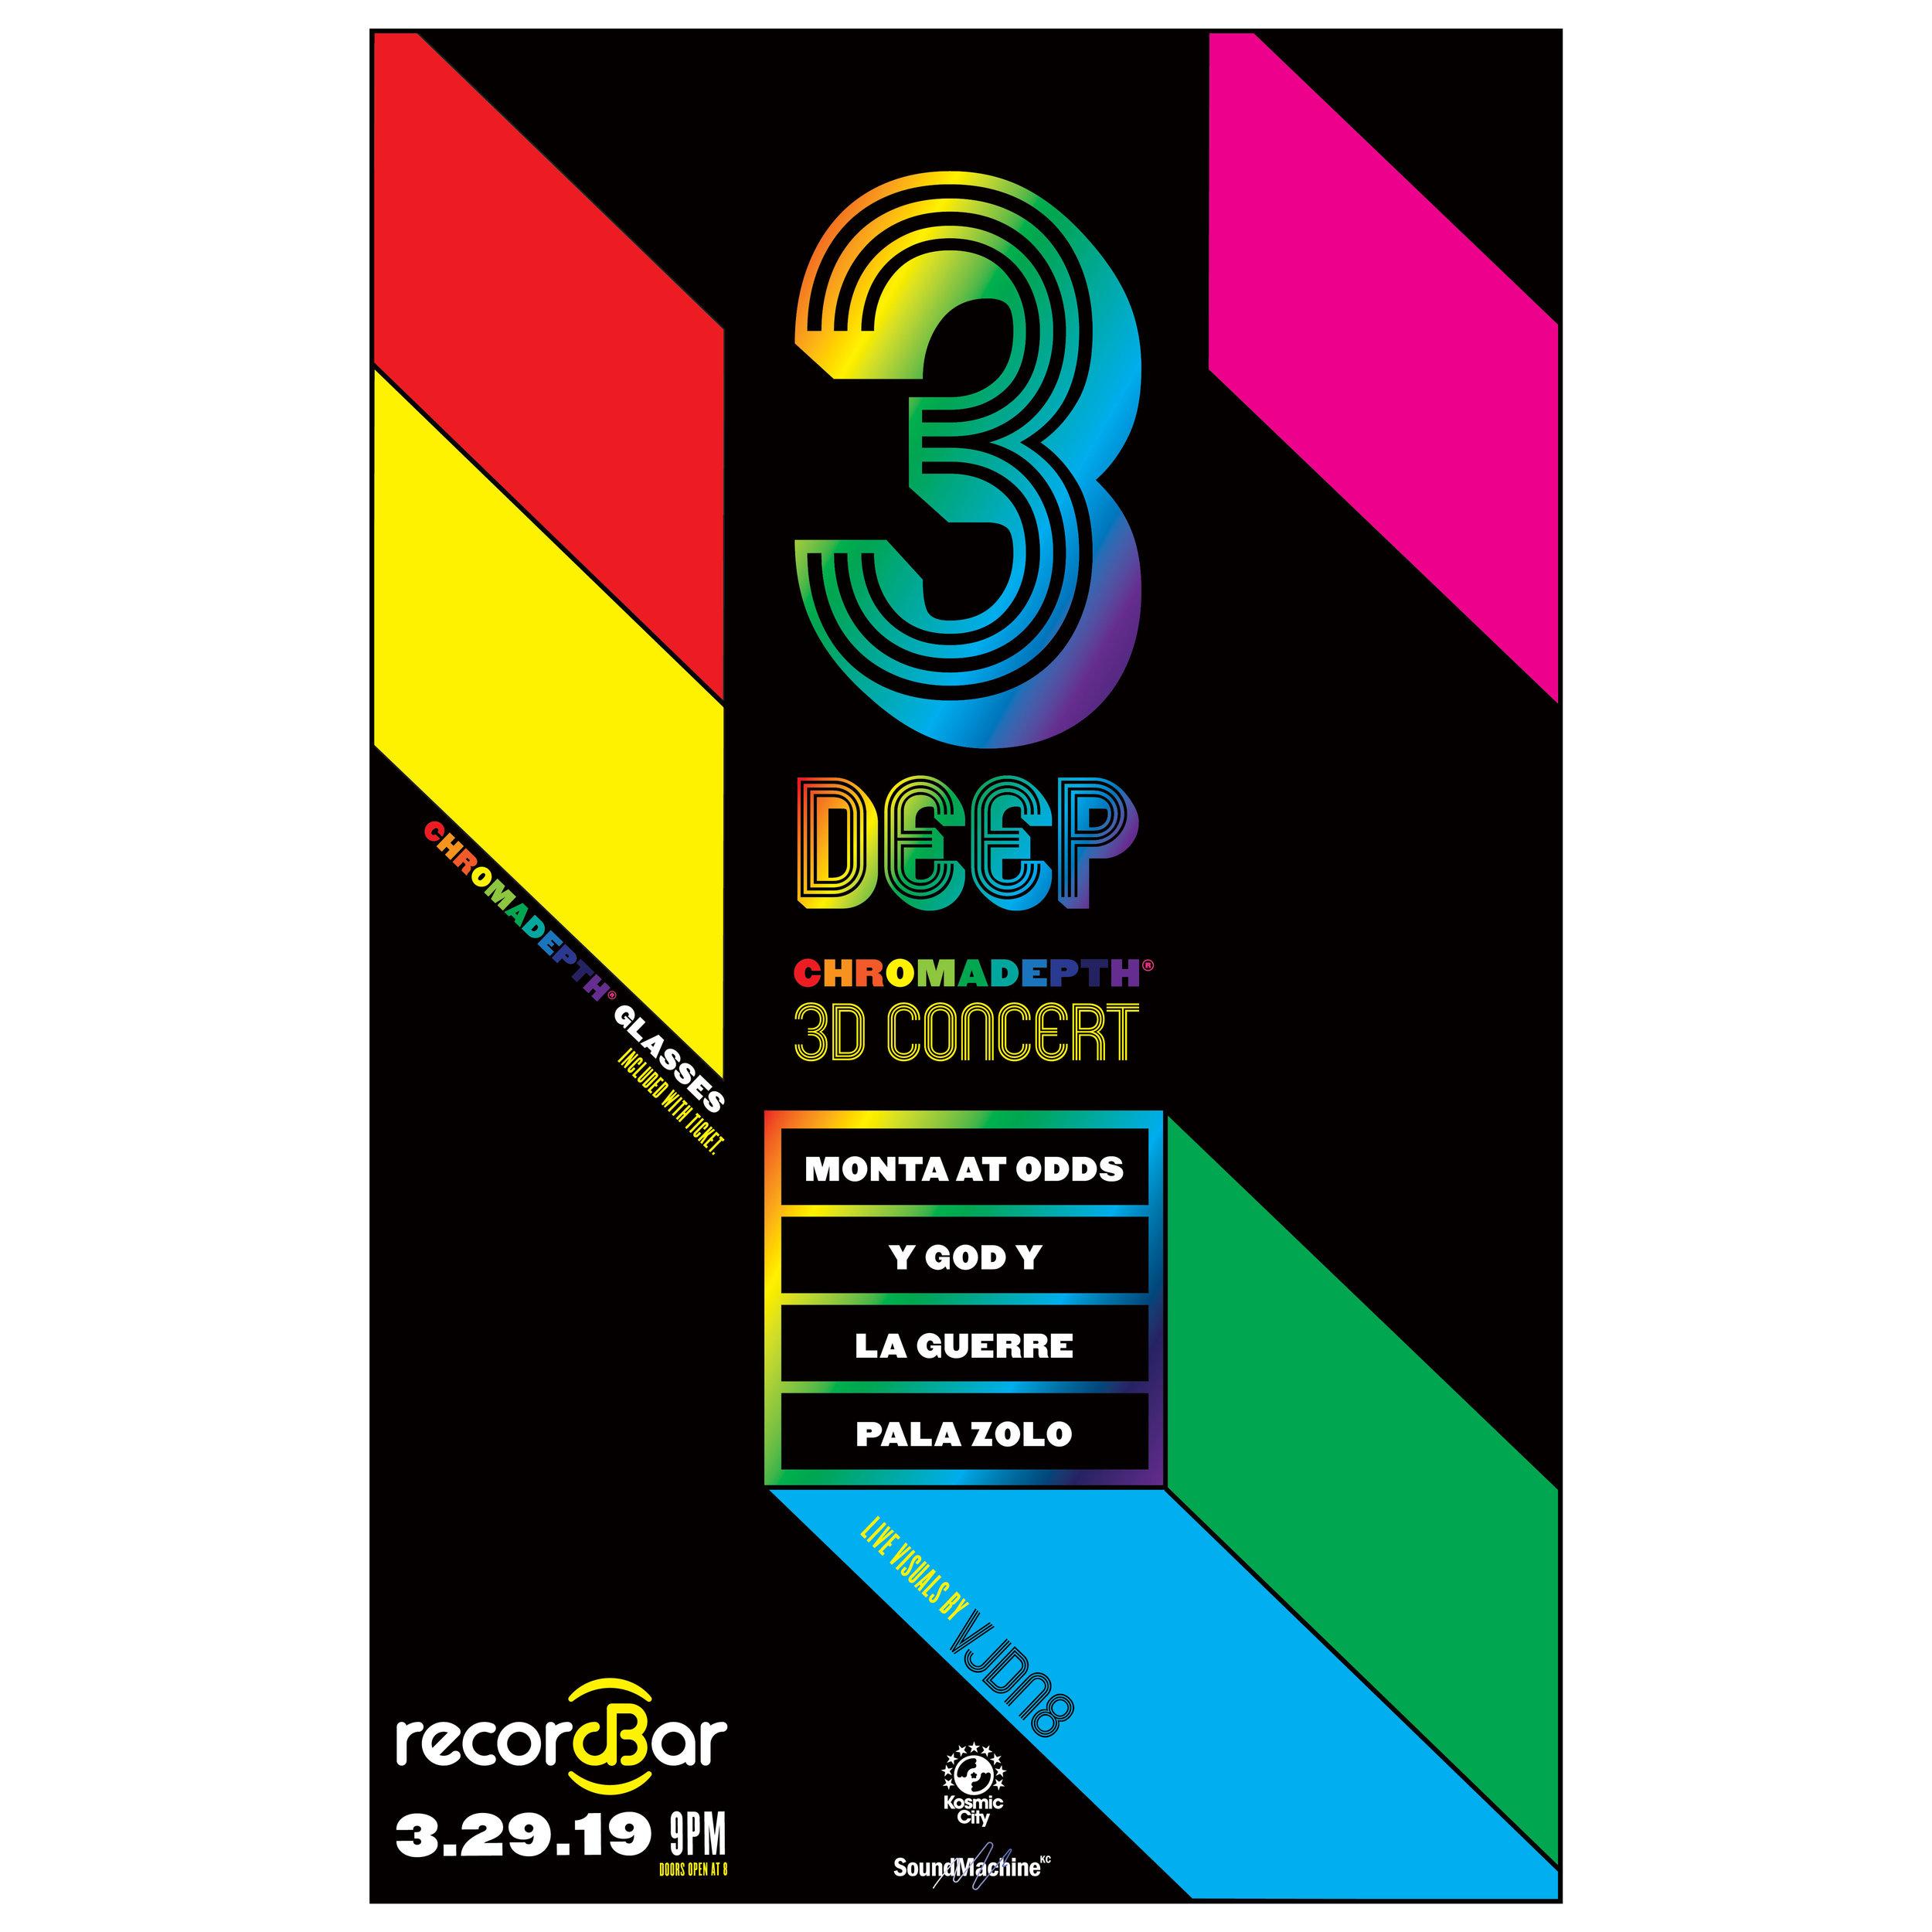 3Deep_Poster_v7-01-sq.jpg